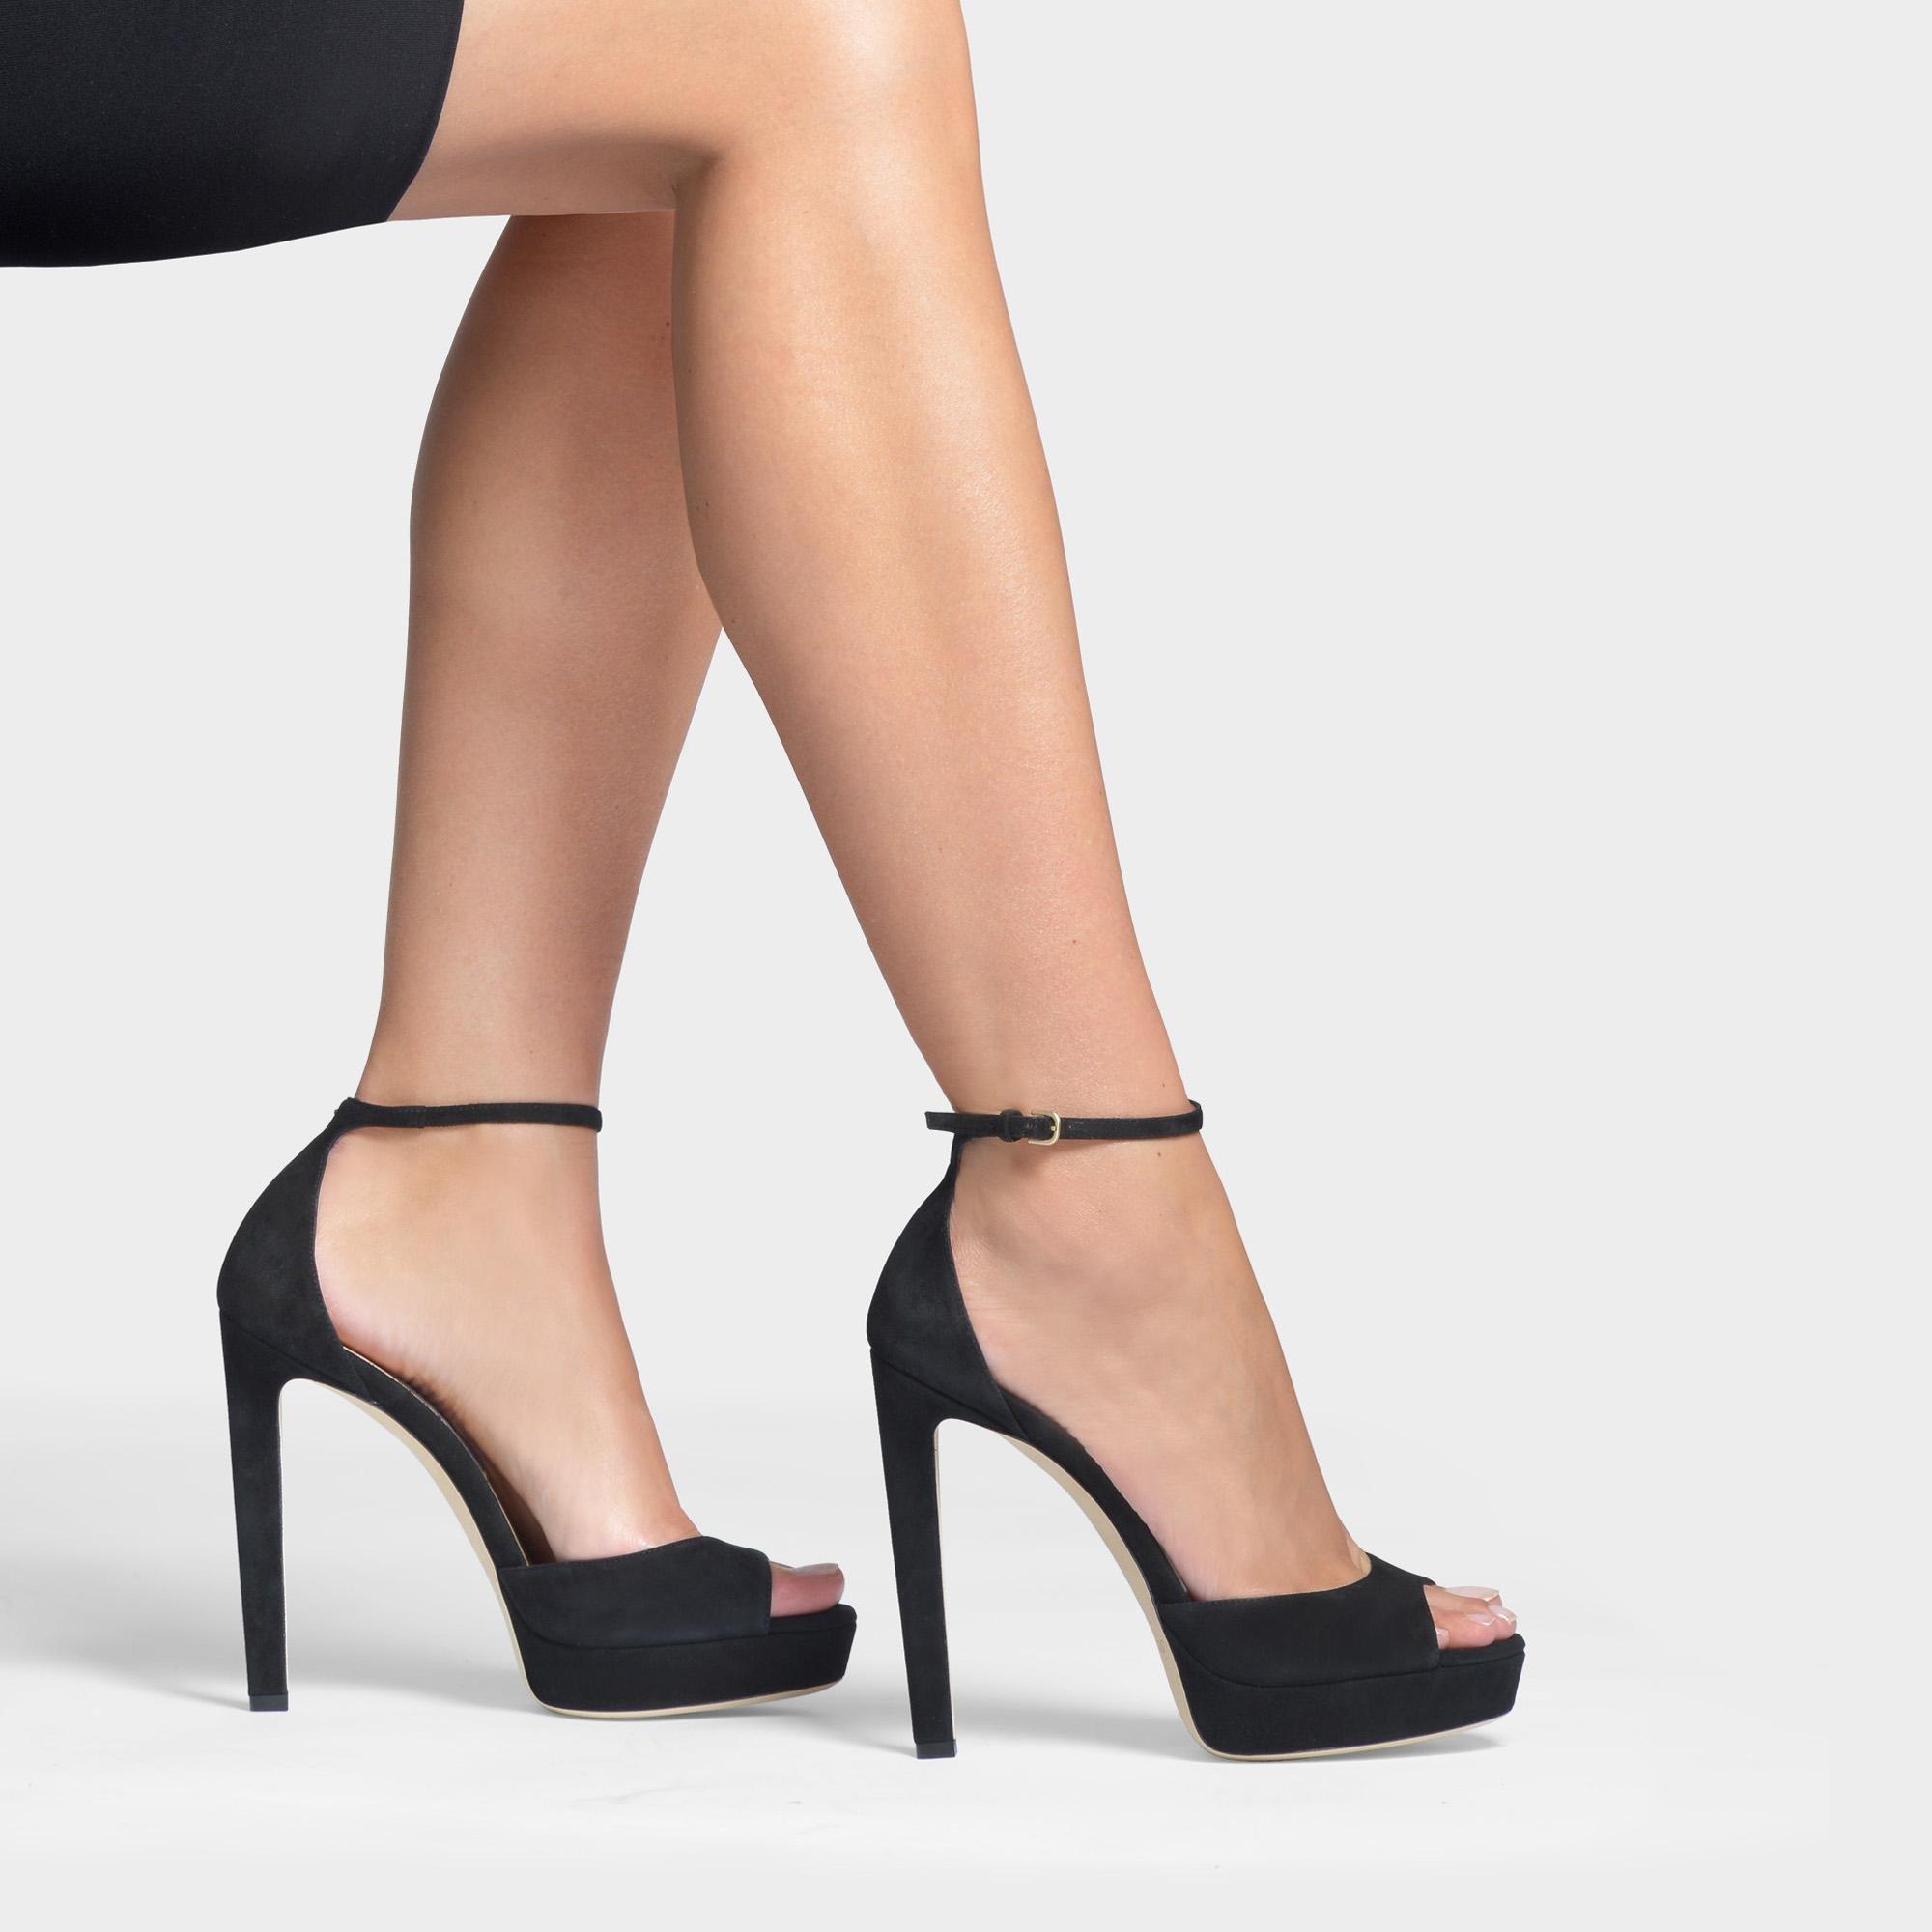 3306366c7aa Jimmy Choo - Pattie 130 Platform Sandals In Black Suede - Lyst. View  fullscreen